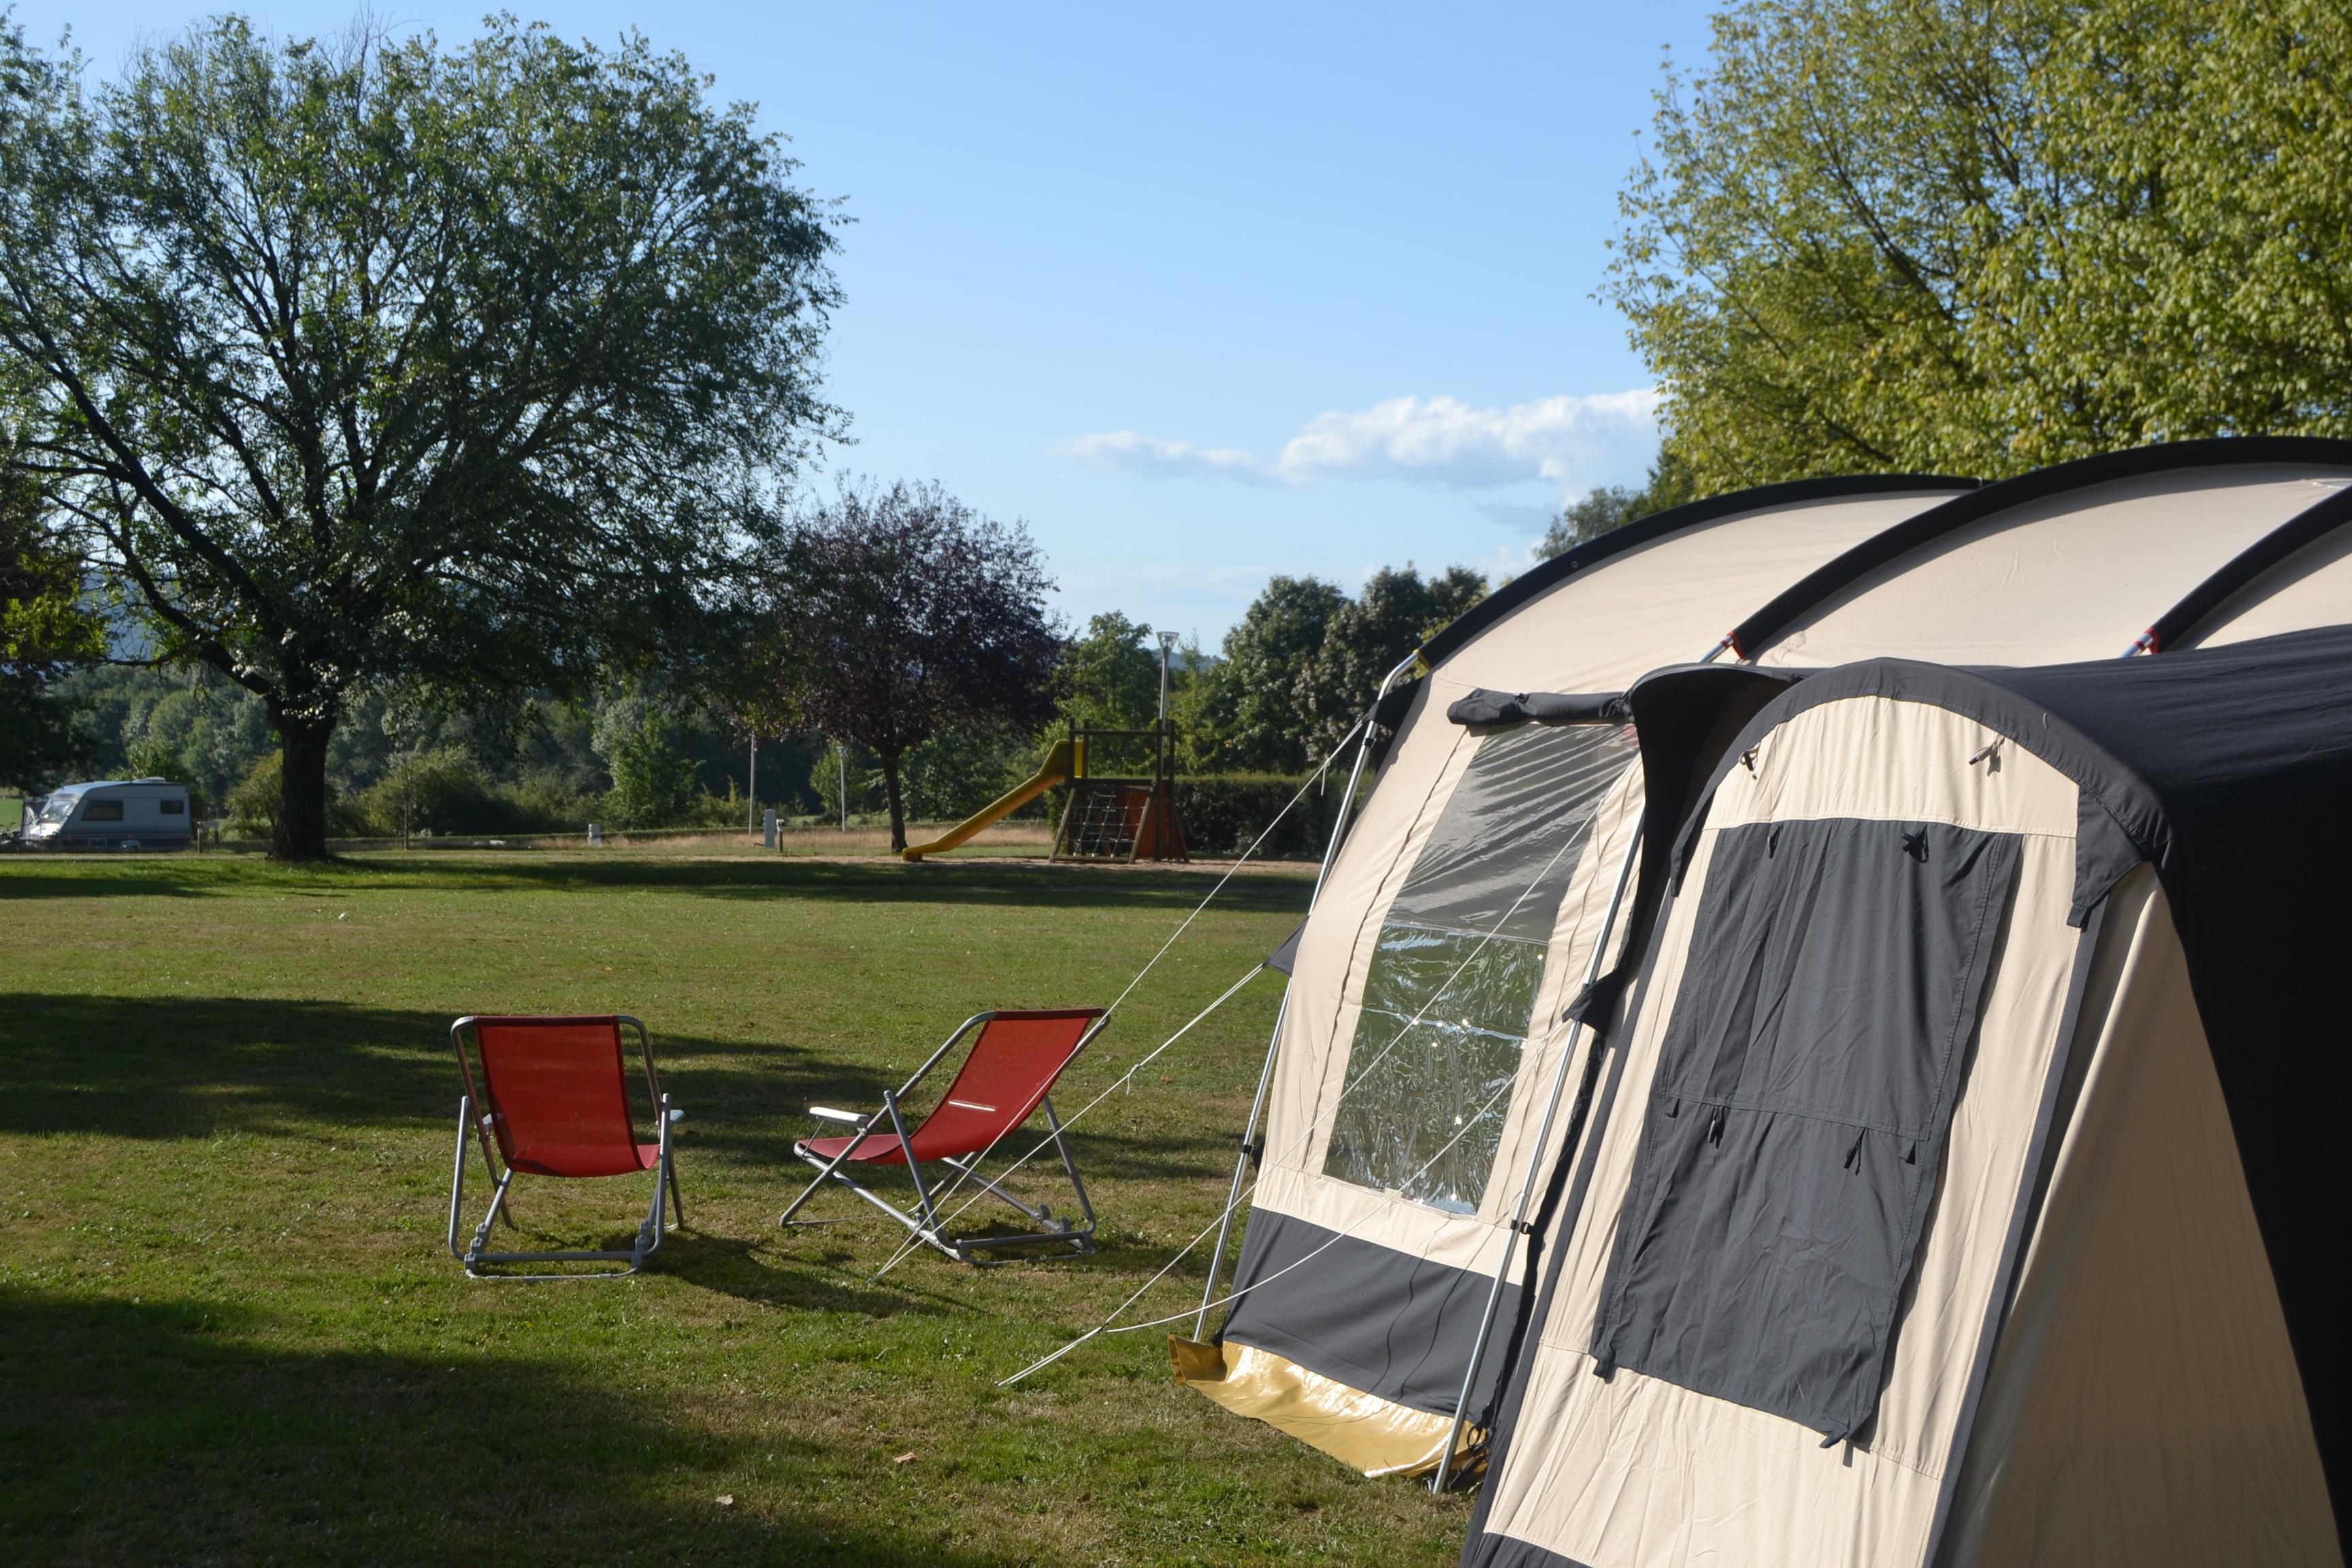 Camping Dun-le-Palestel, Dun-le-Palestel, Creuse